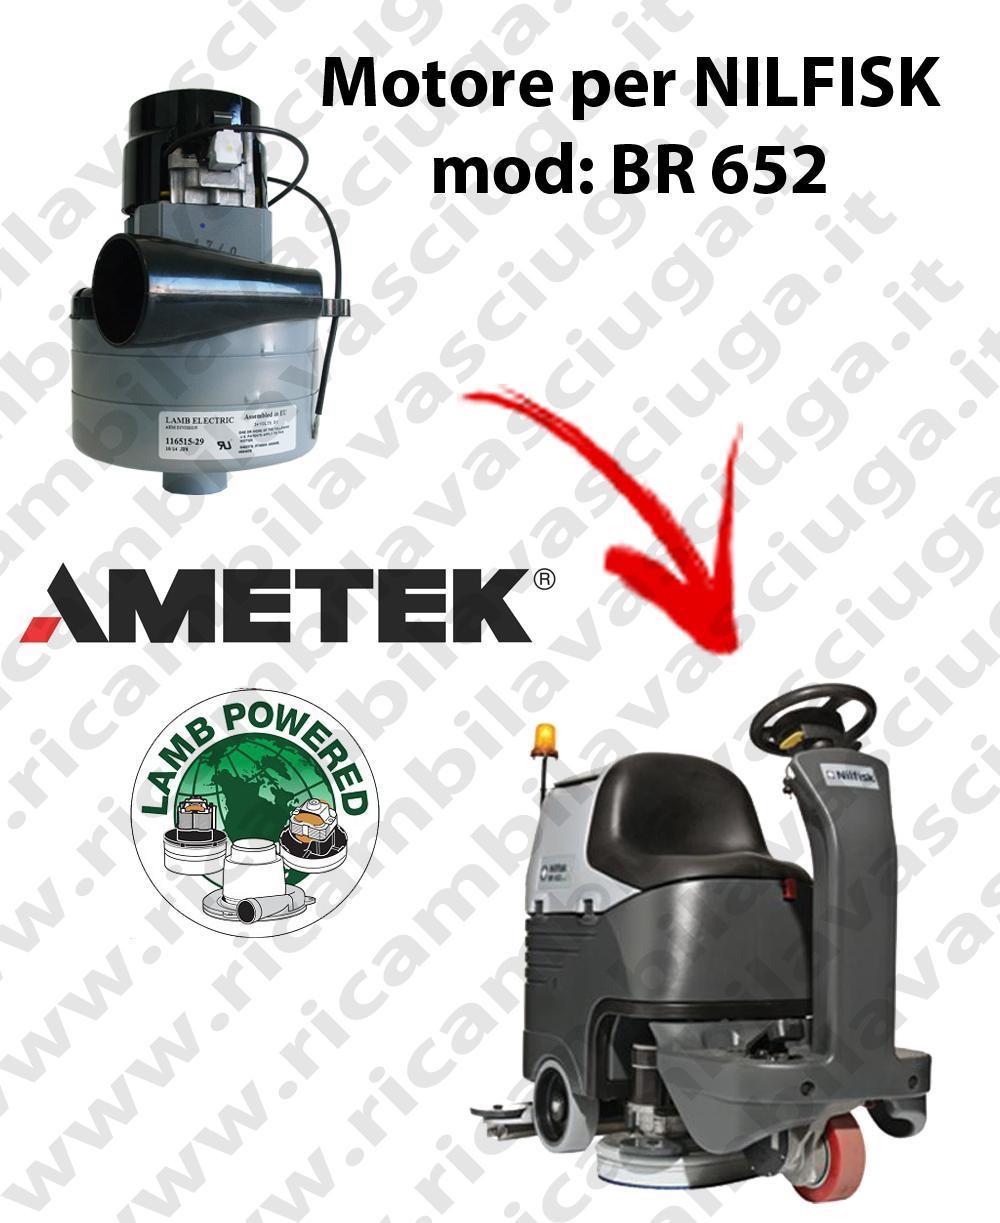 BR 652 Saugmotor LAMB AMETEK für scheuersaugmaschinen NILFISK